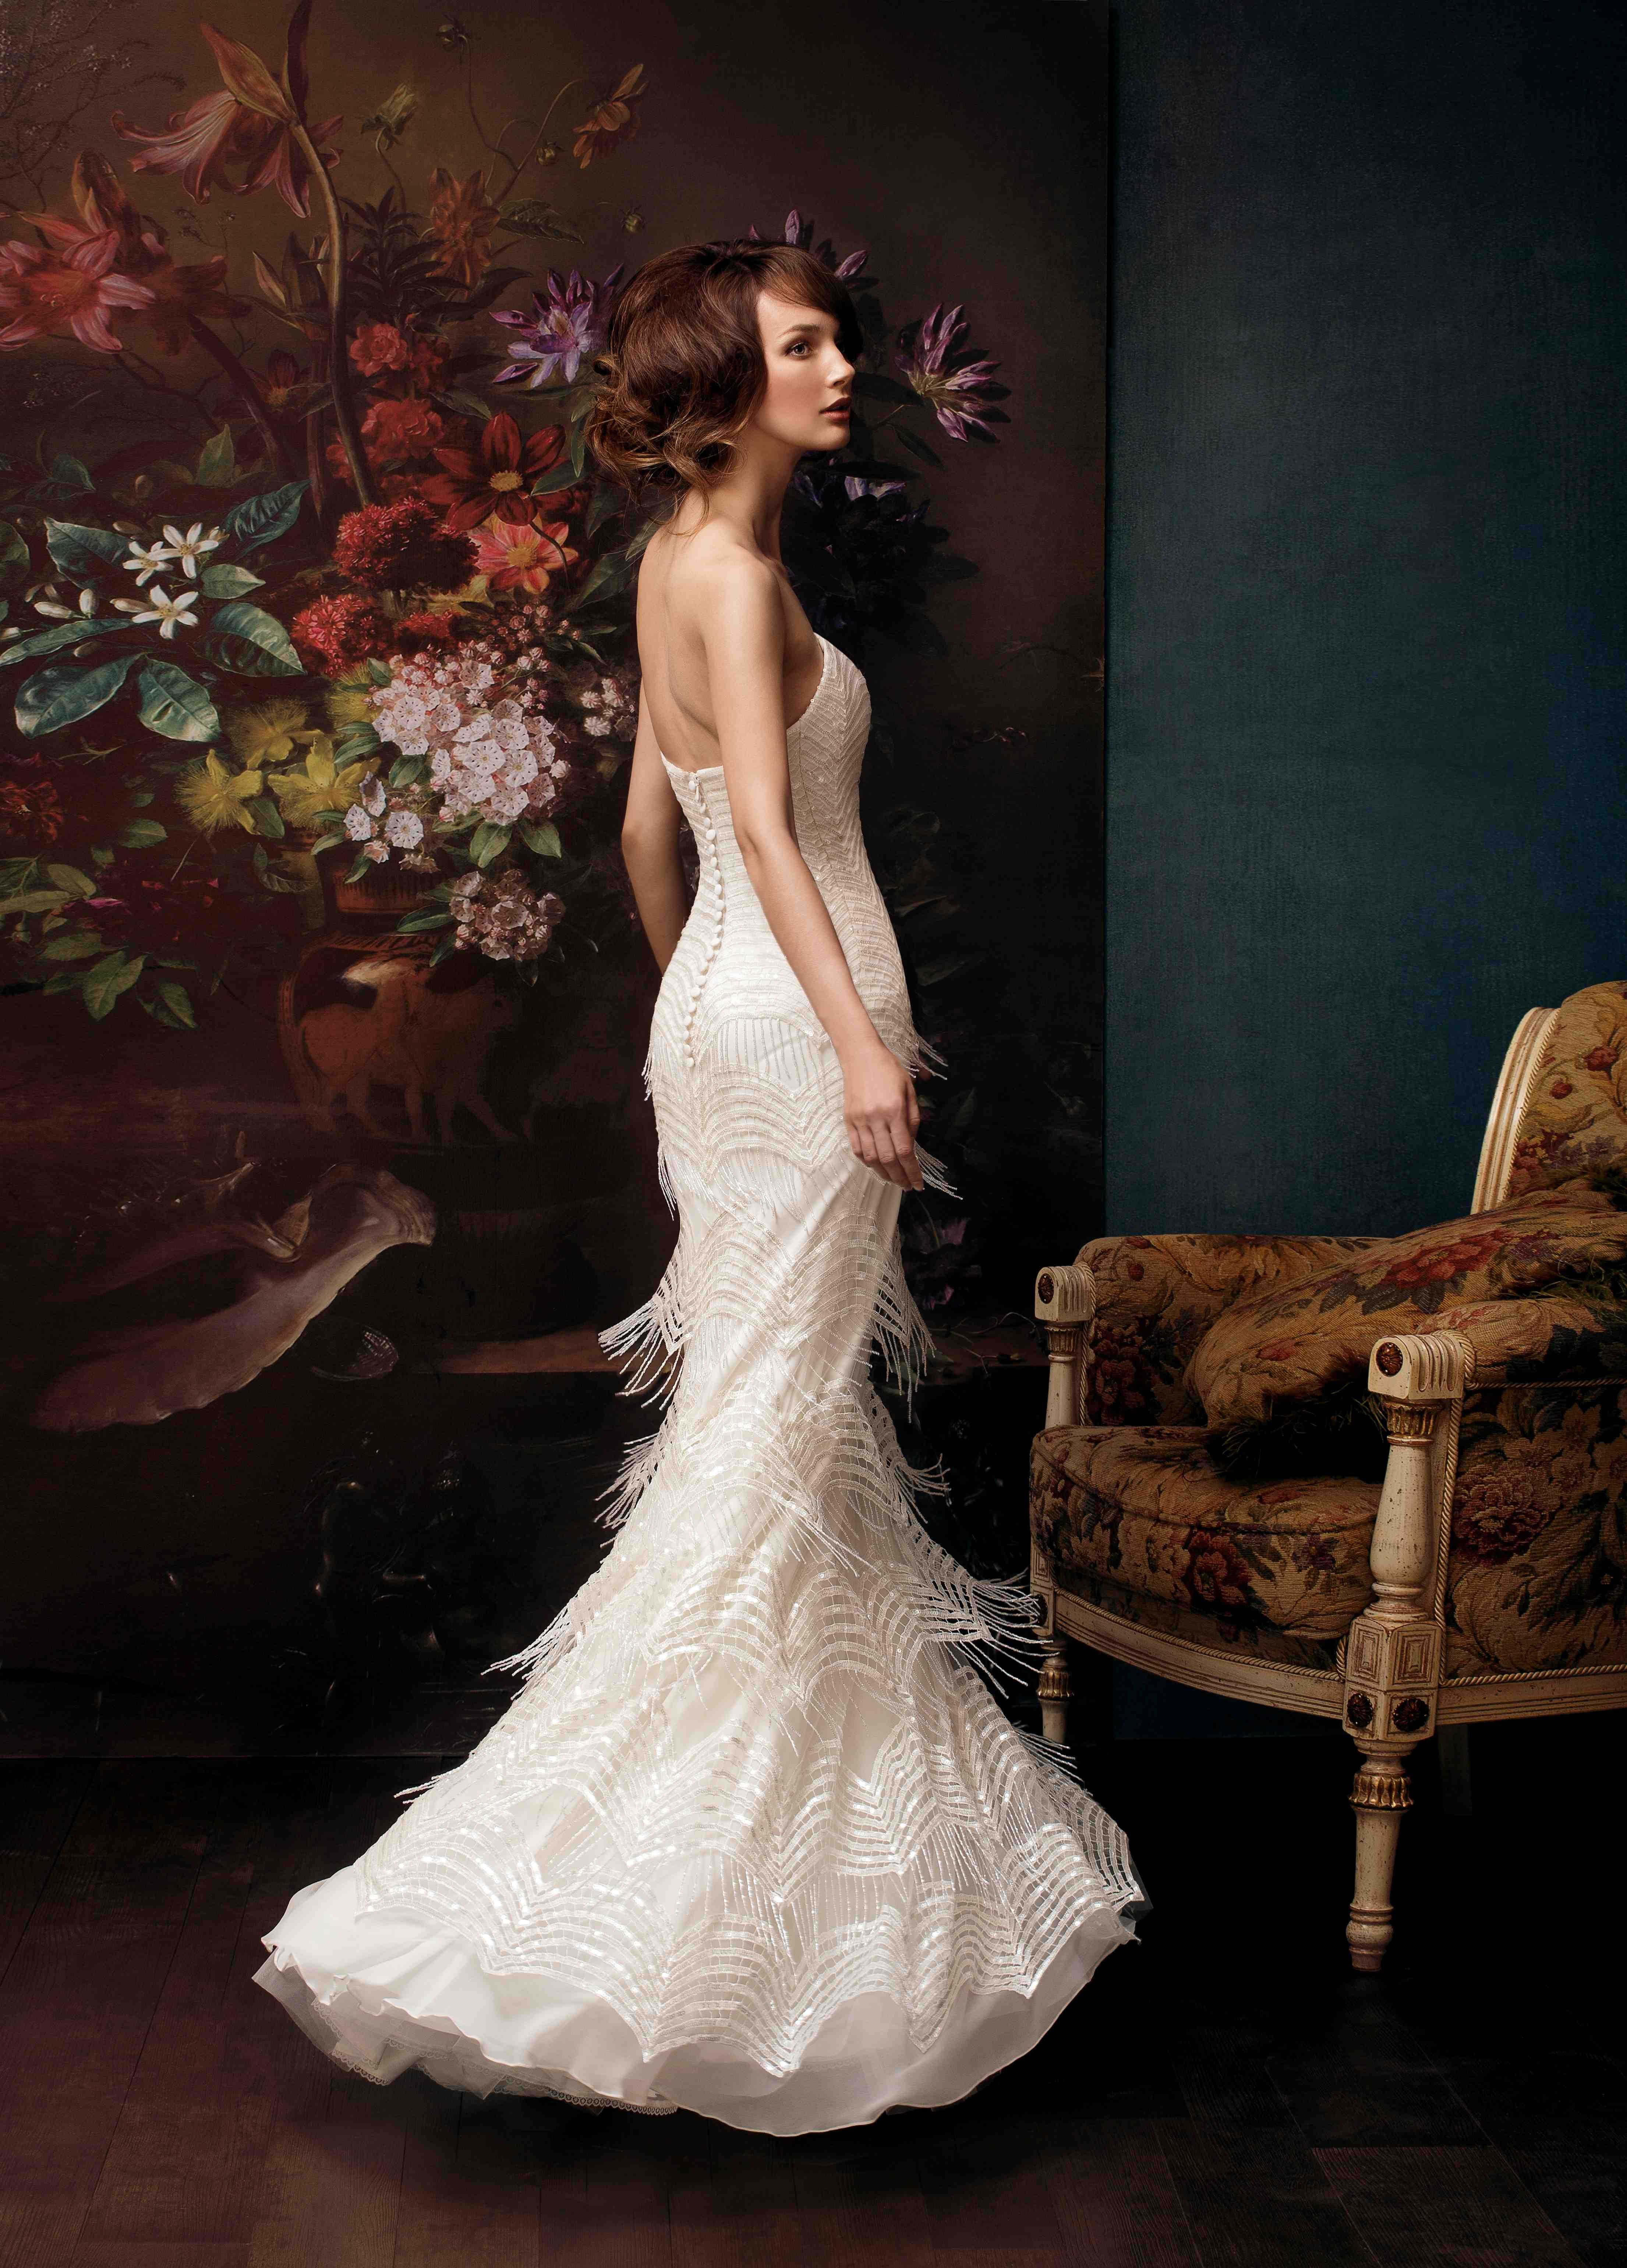 The most expensive wedding dress  A breathtaking luxurious silhouette emphasizes brideus figure